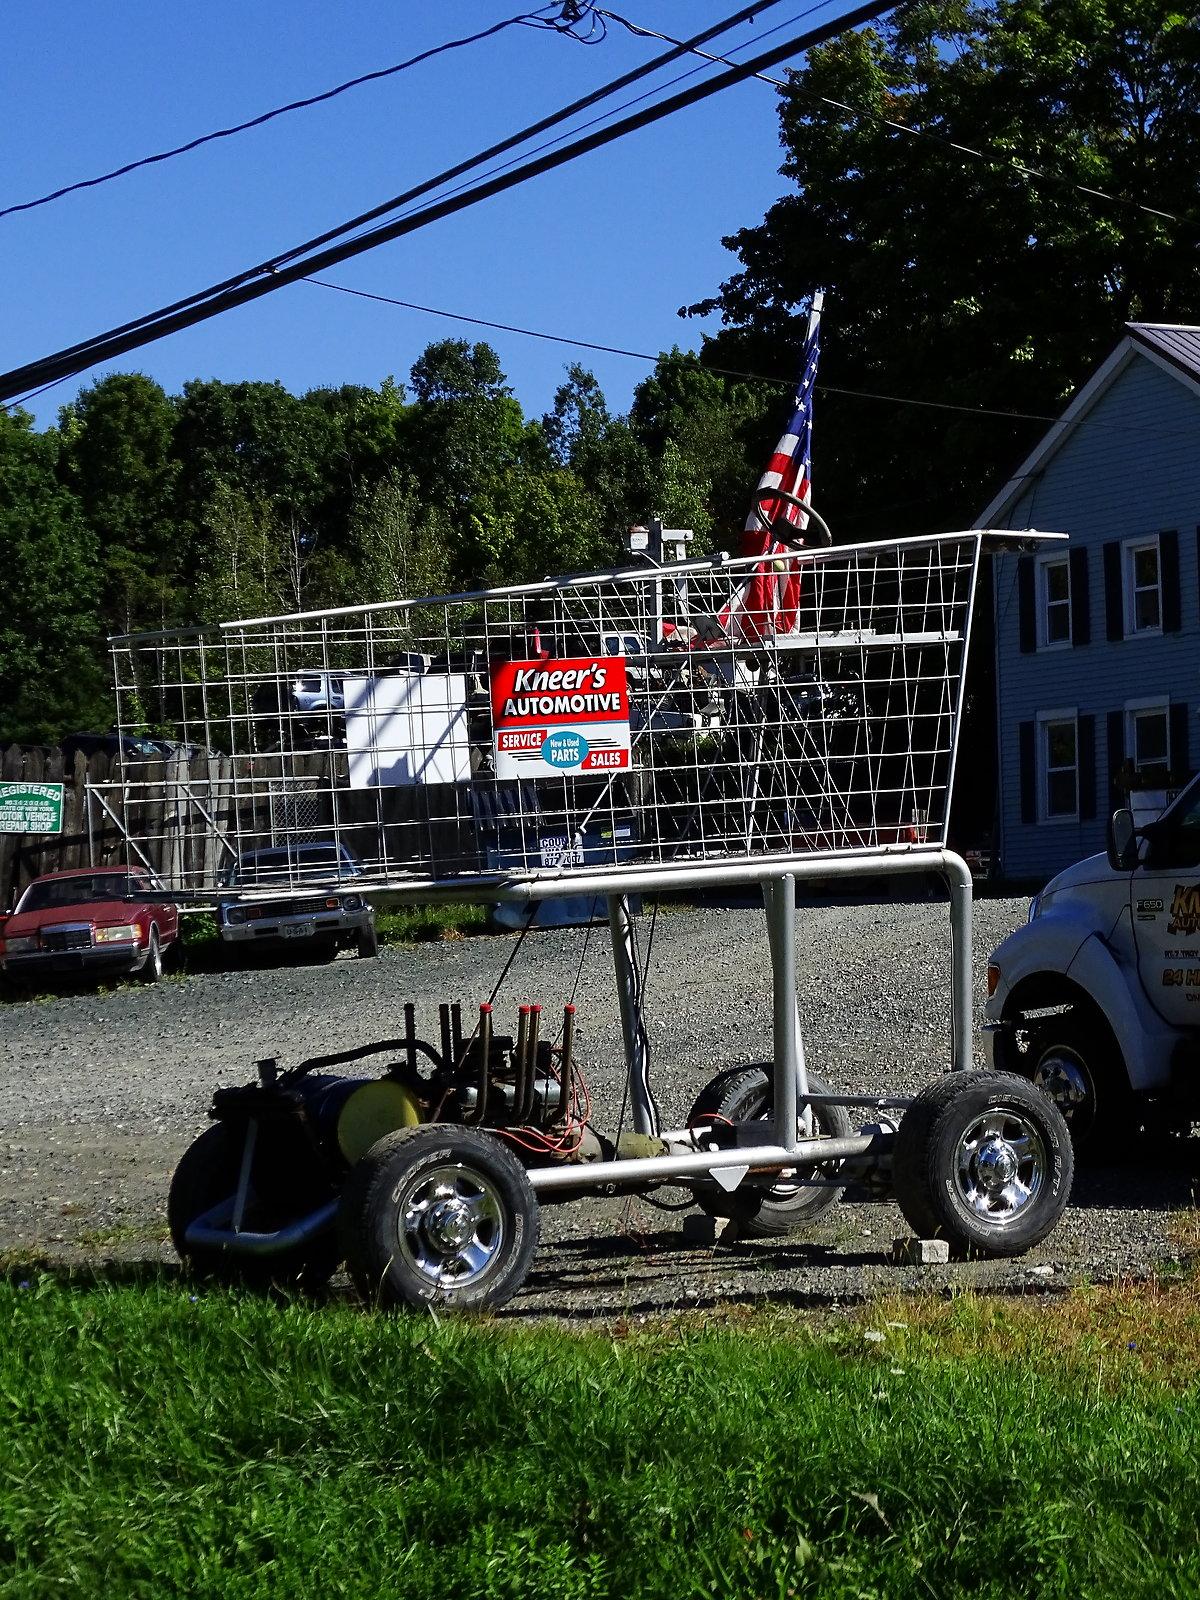 HX400V peebles island speedy shopping cart 002.JPG